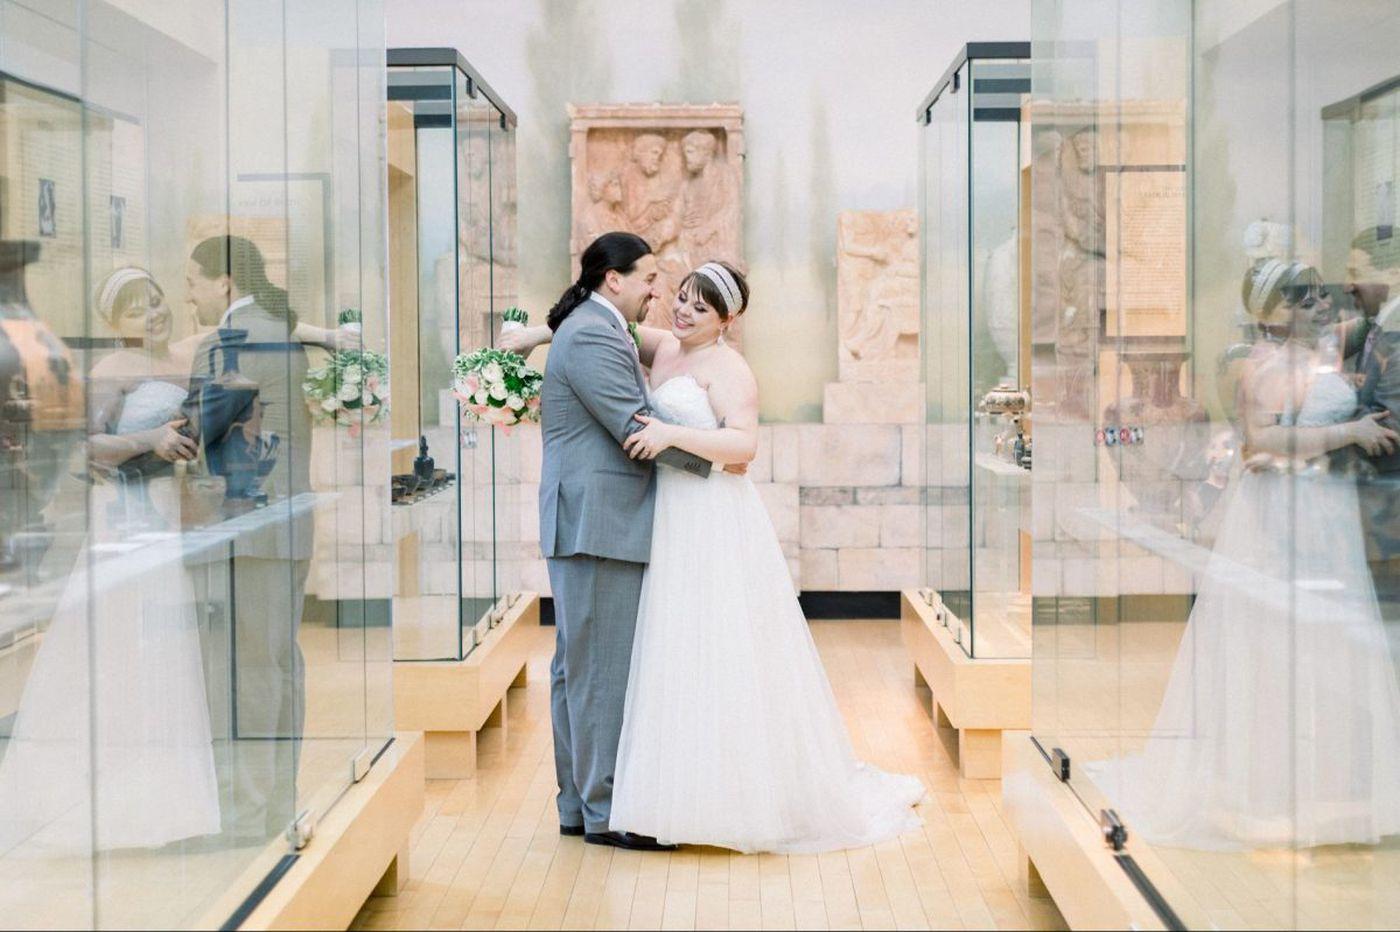 Philadelphia weddings: Mia Cammisa and Anthony Briglia